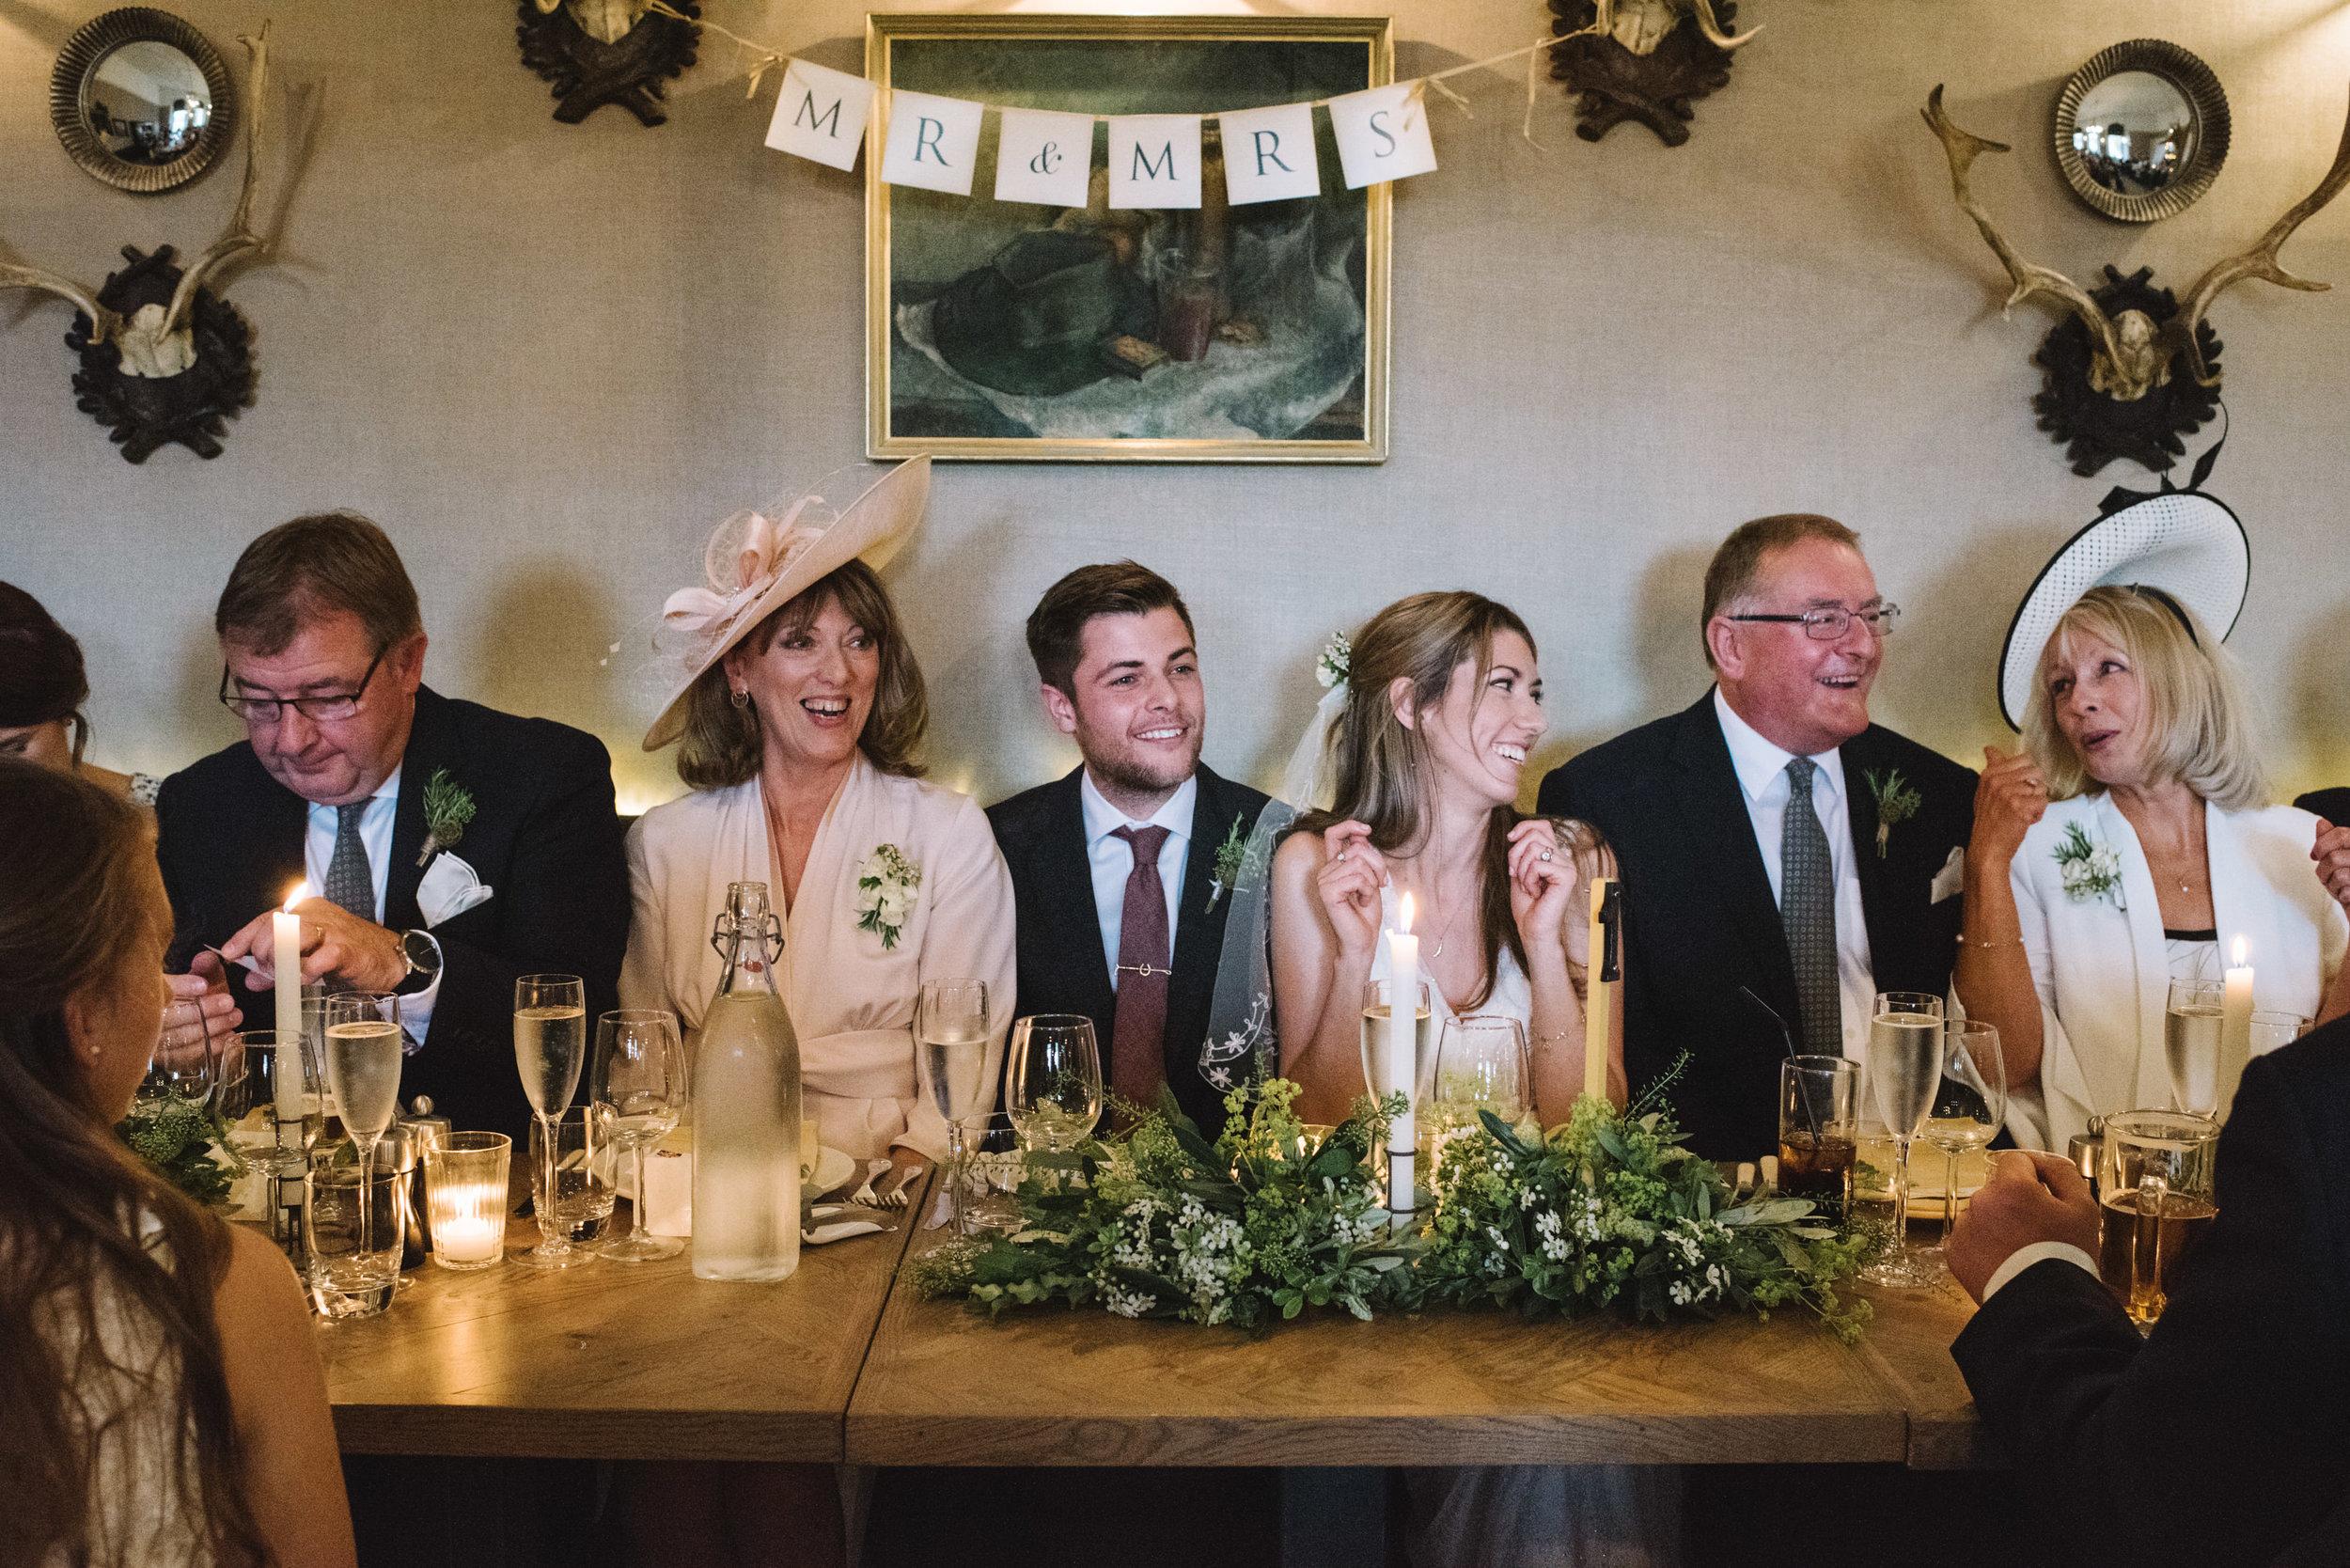 0241-LISA-DEVINE-PHOTOGRAPHY-ALTERNATIVE-WEDDING-PHOTOGRAPHY-SCOTLAND-DESTINATION-WEDDINGS-GLASGOW-WEDDINGS-COOL-WEDDINGS-STYLISH-WEDDINGS.JPG